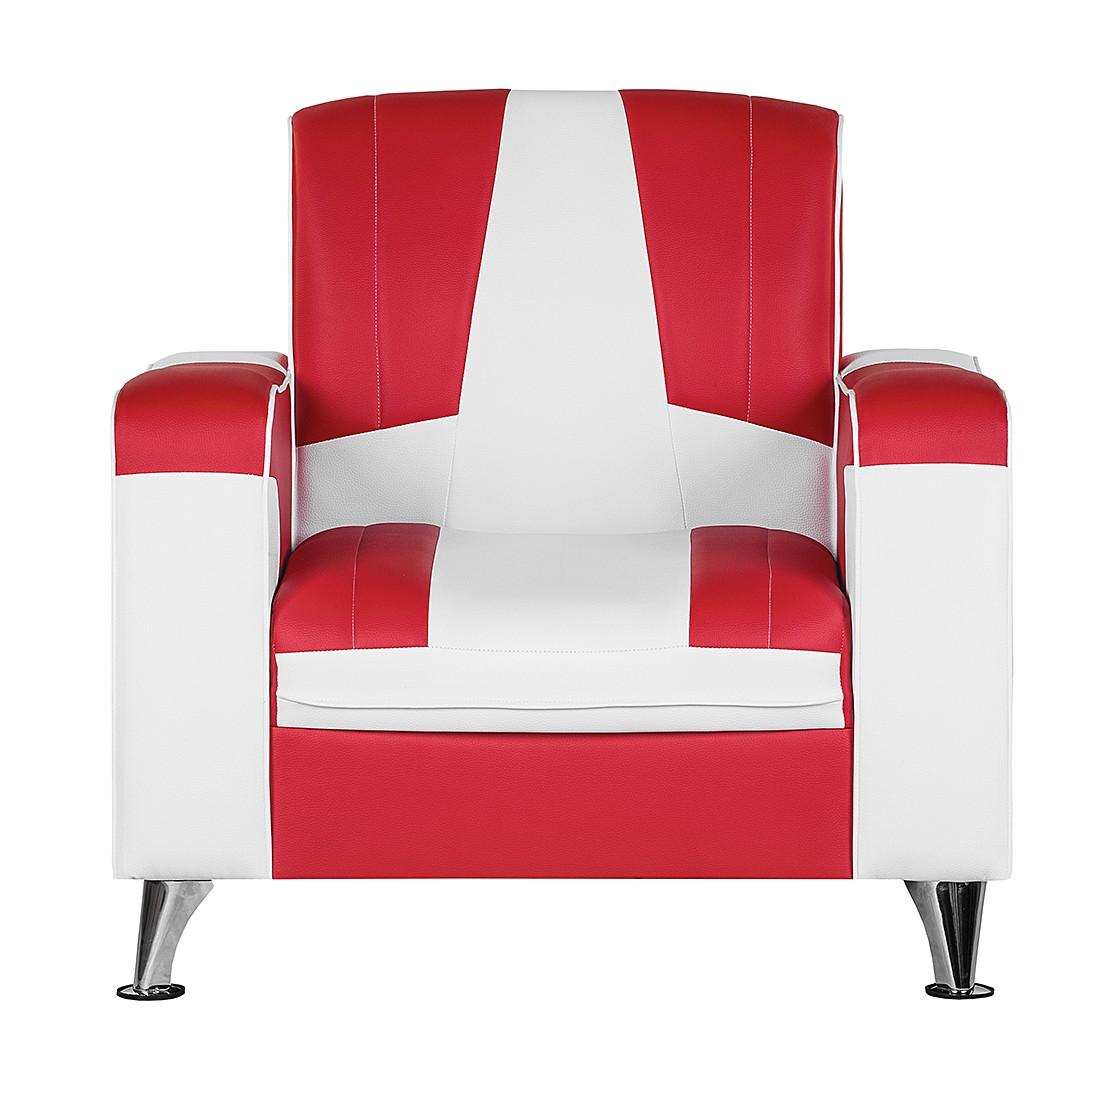 sessel nixa kunstleder rot wei studio monroe g nstig bestellen. Black Bedroom Furniture Sets. Home Design Ideas